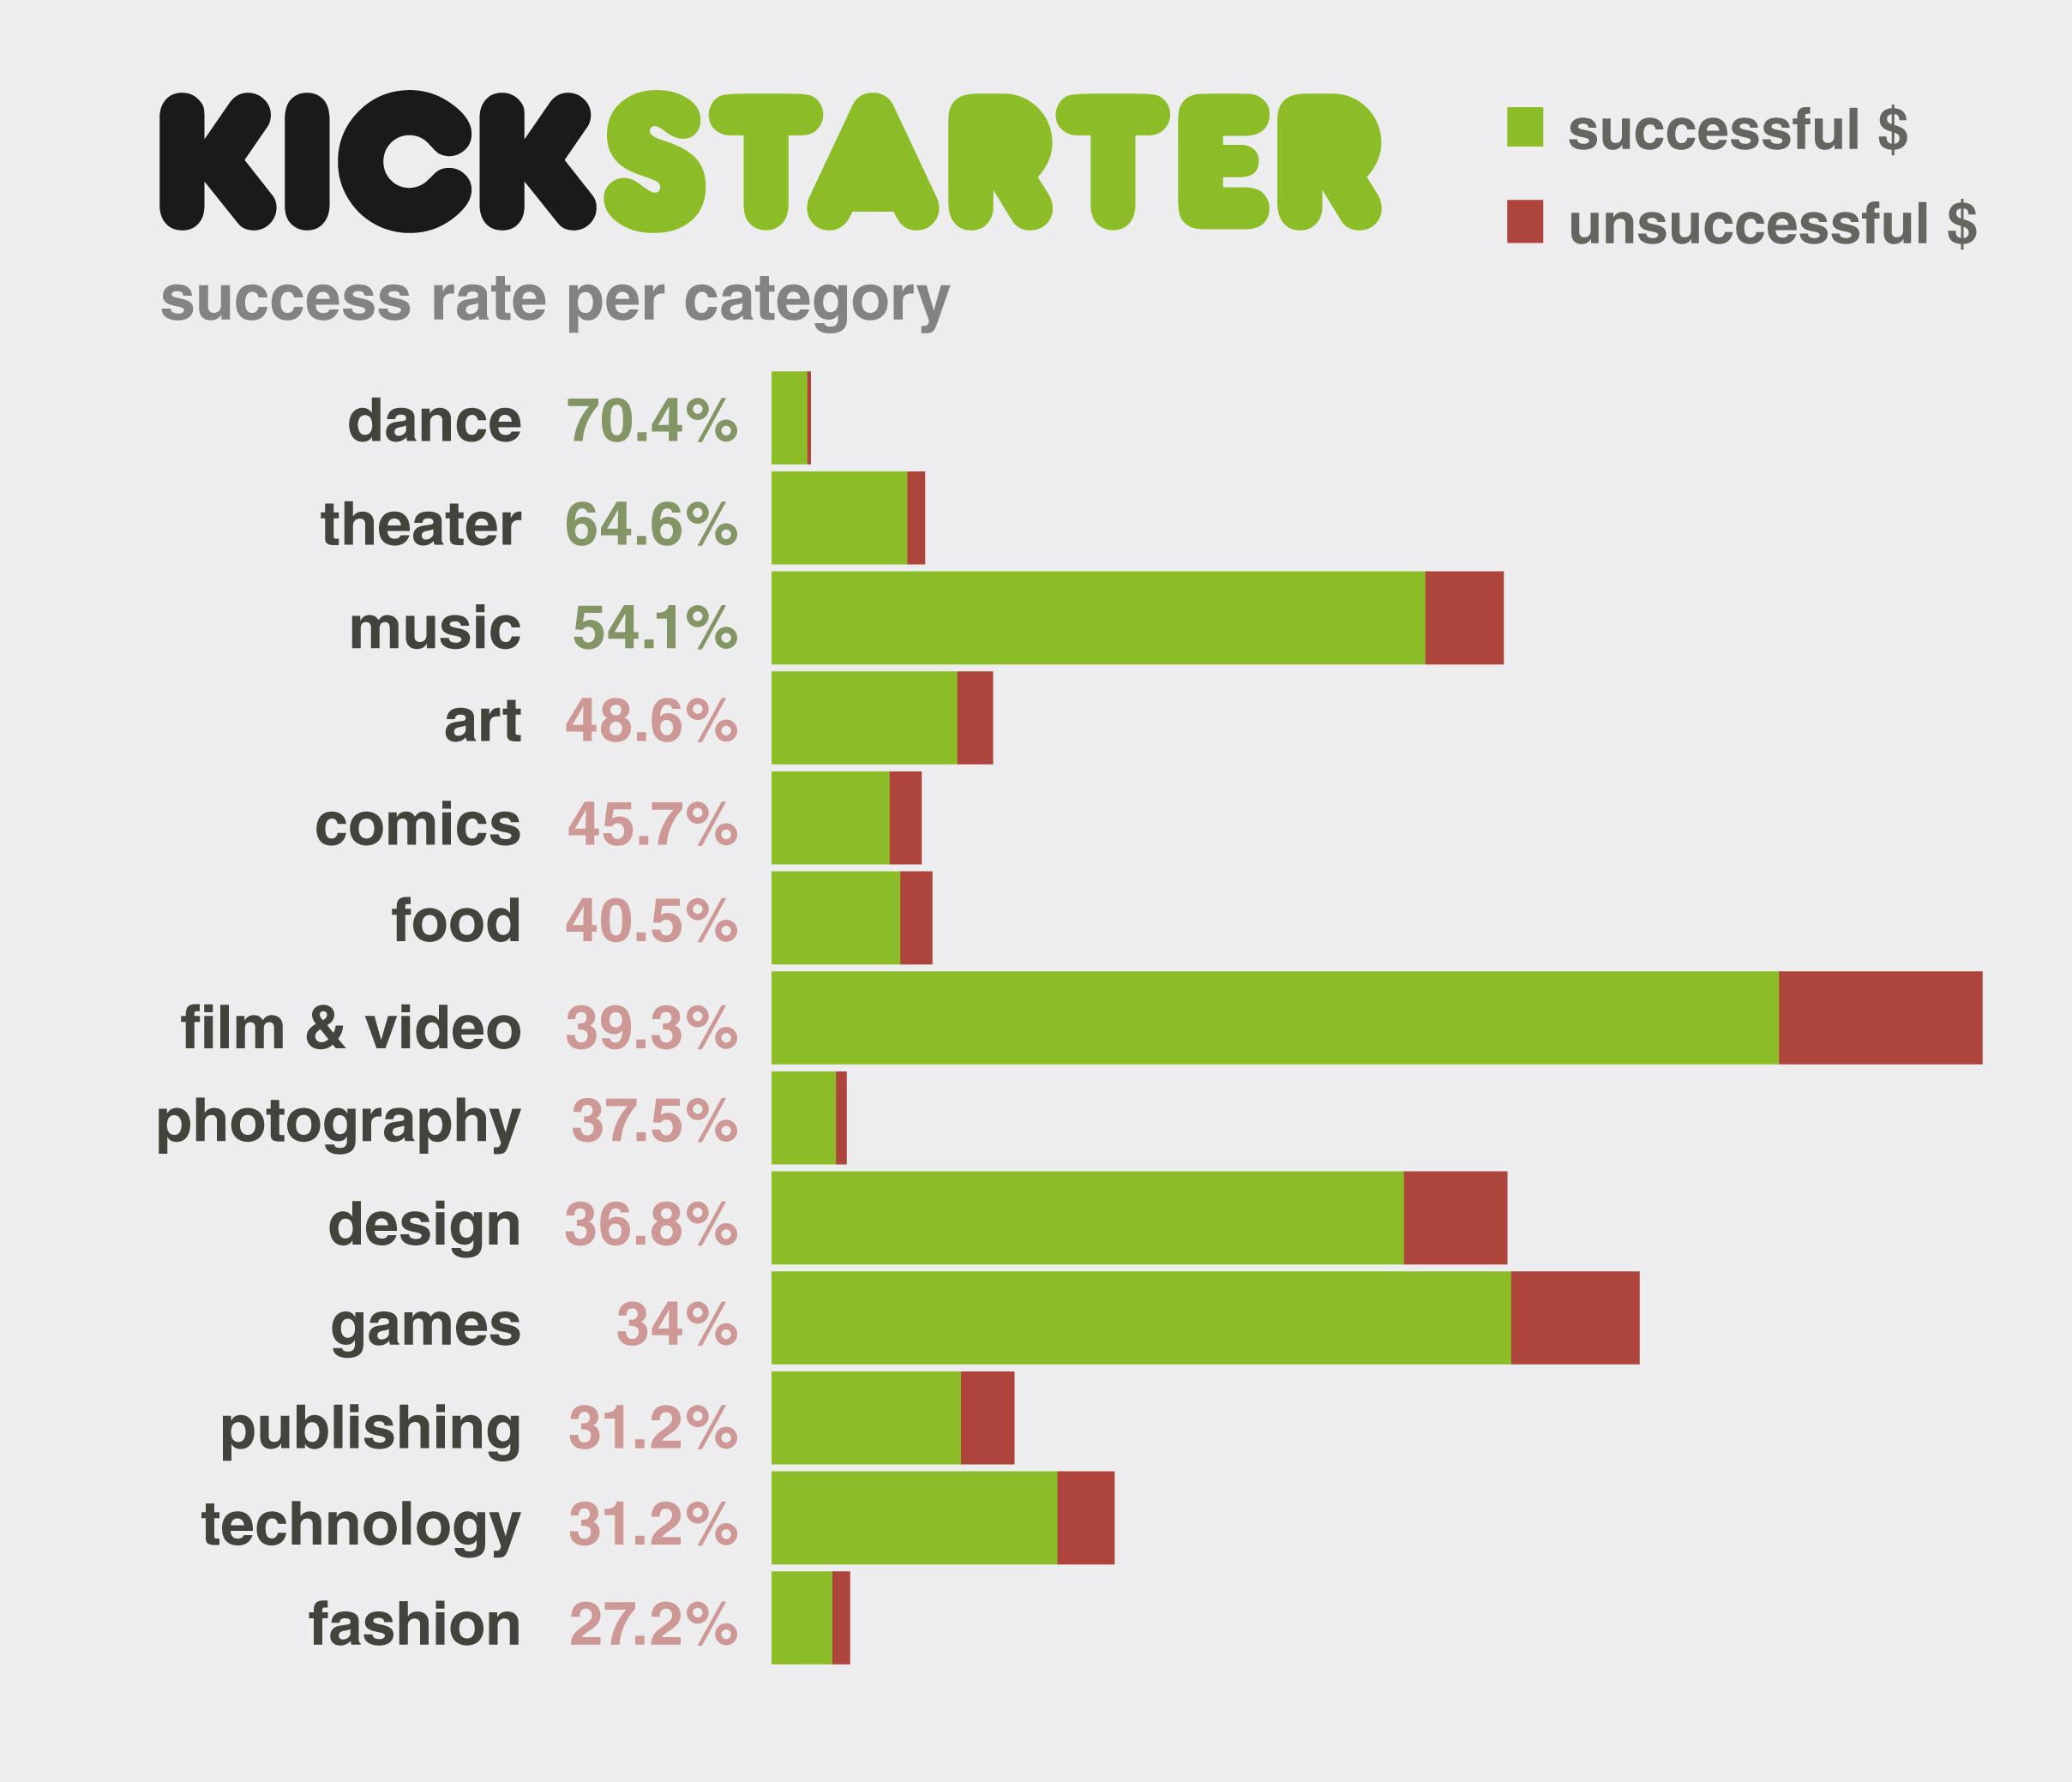 http://www.therobotspajamas.com/wp-content/uploads/2013/08/kickstarter_graph51.jpg